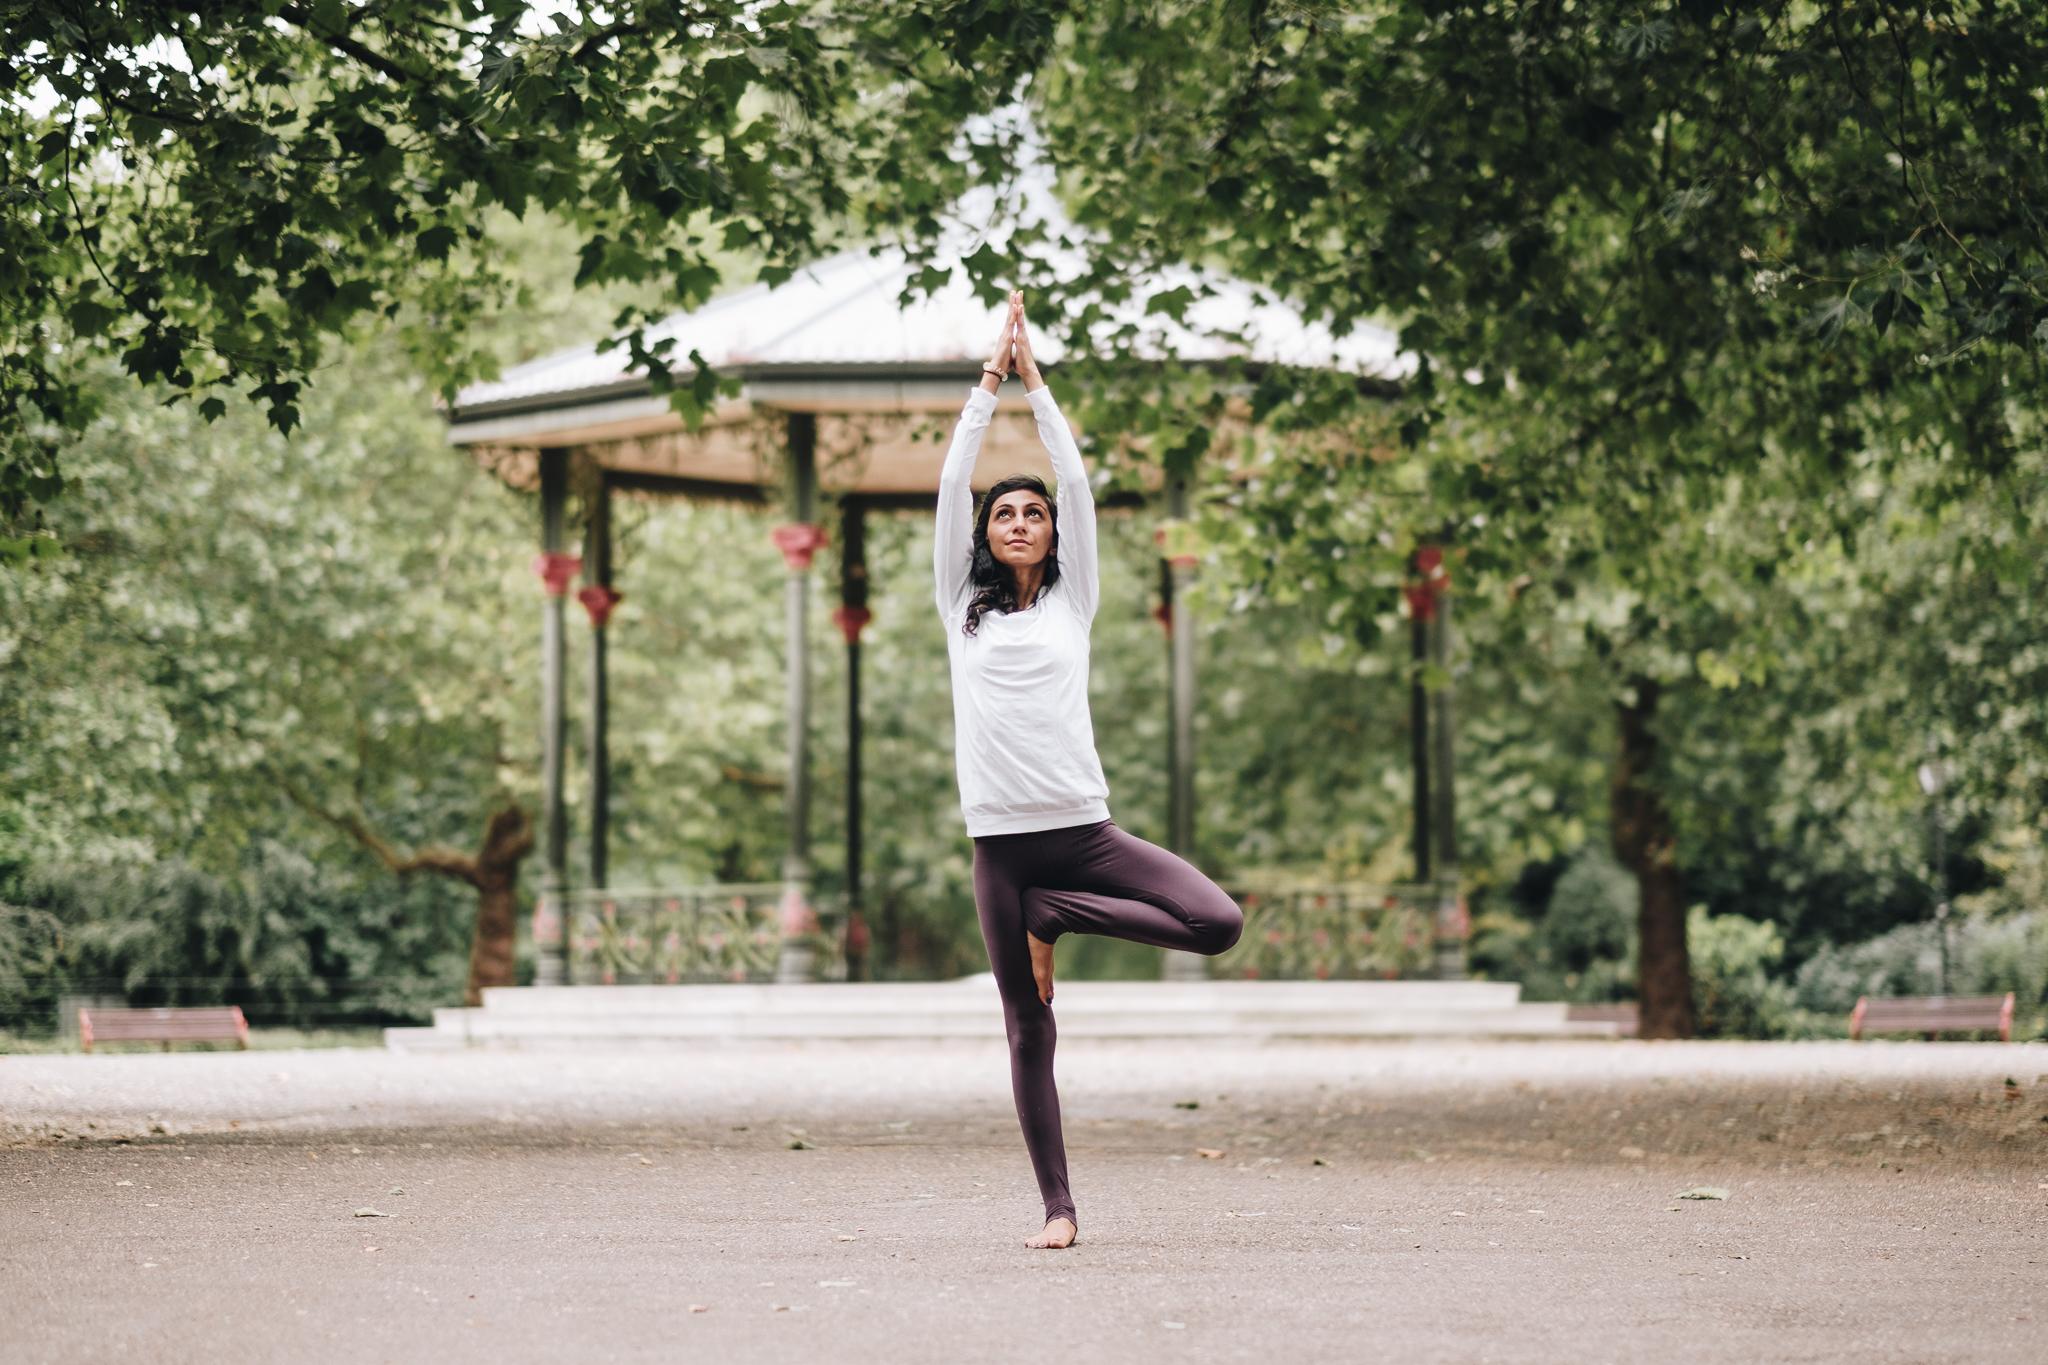 FXT11508 Zainab London Yoga Photography Zainab   Yoga Photography   Battersea Park, London